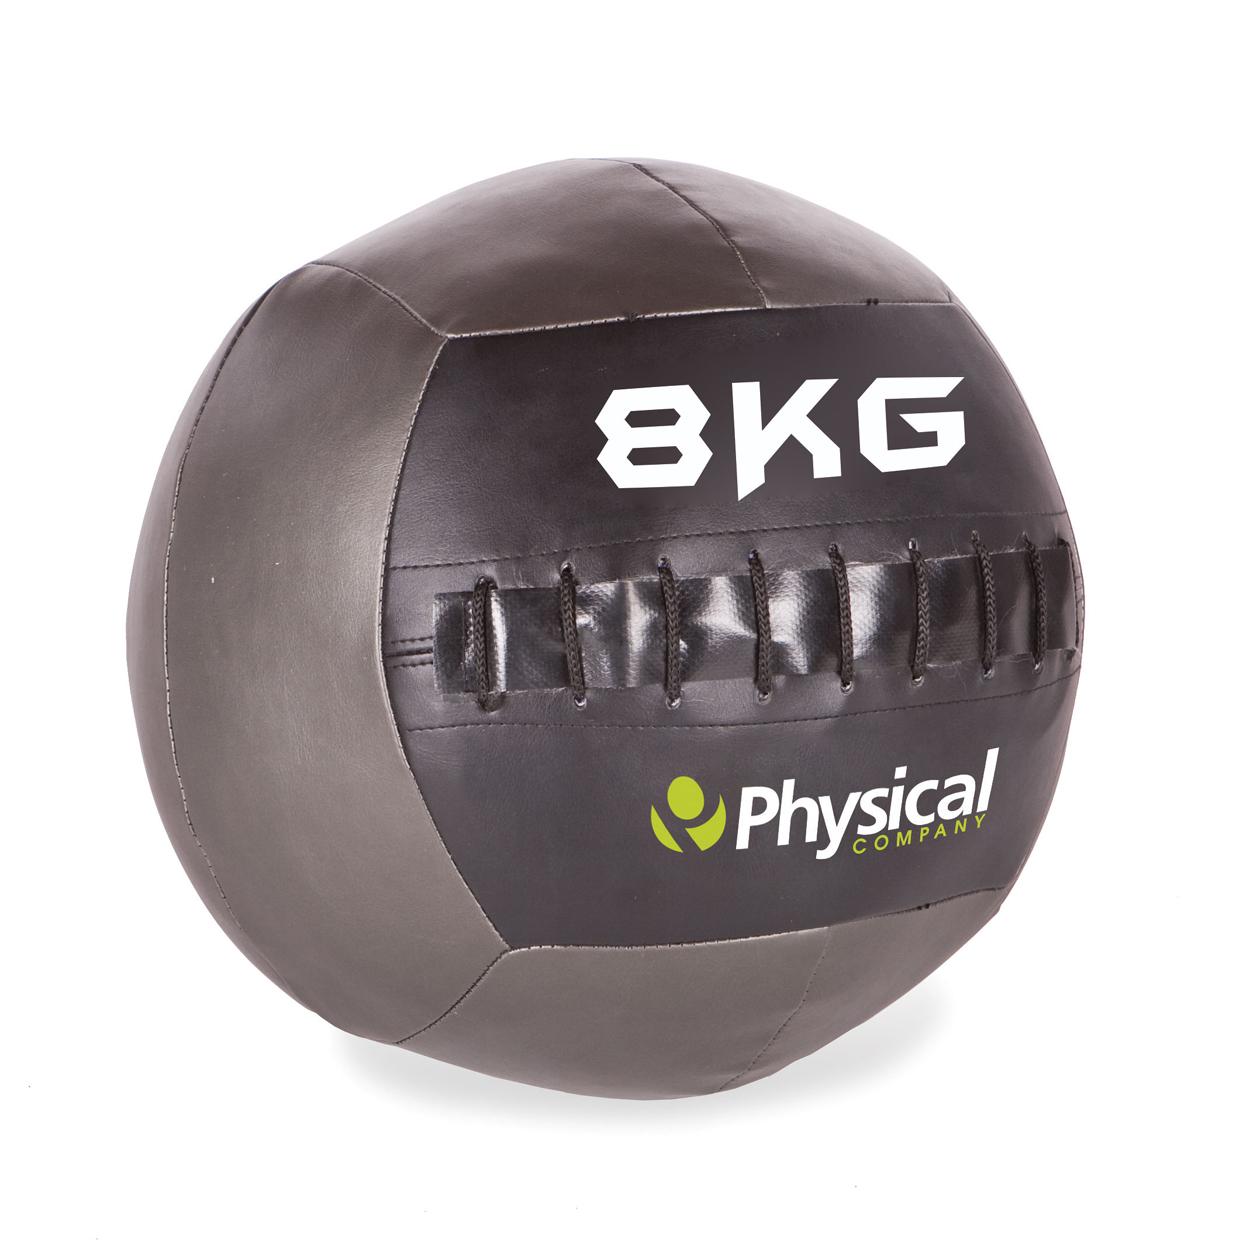 8kg Wall Ball